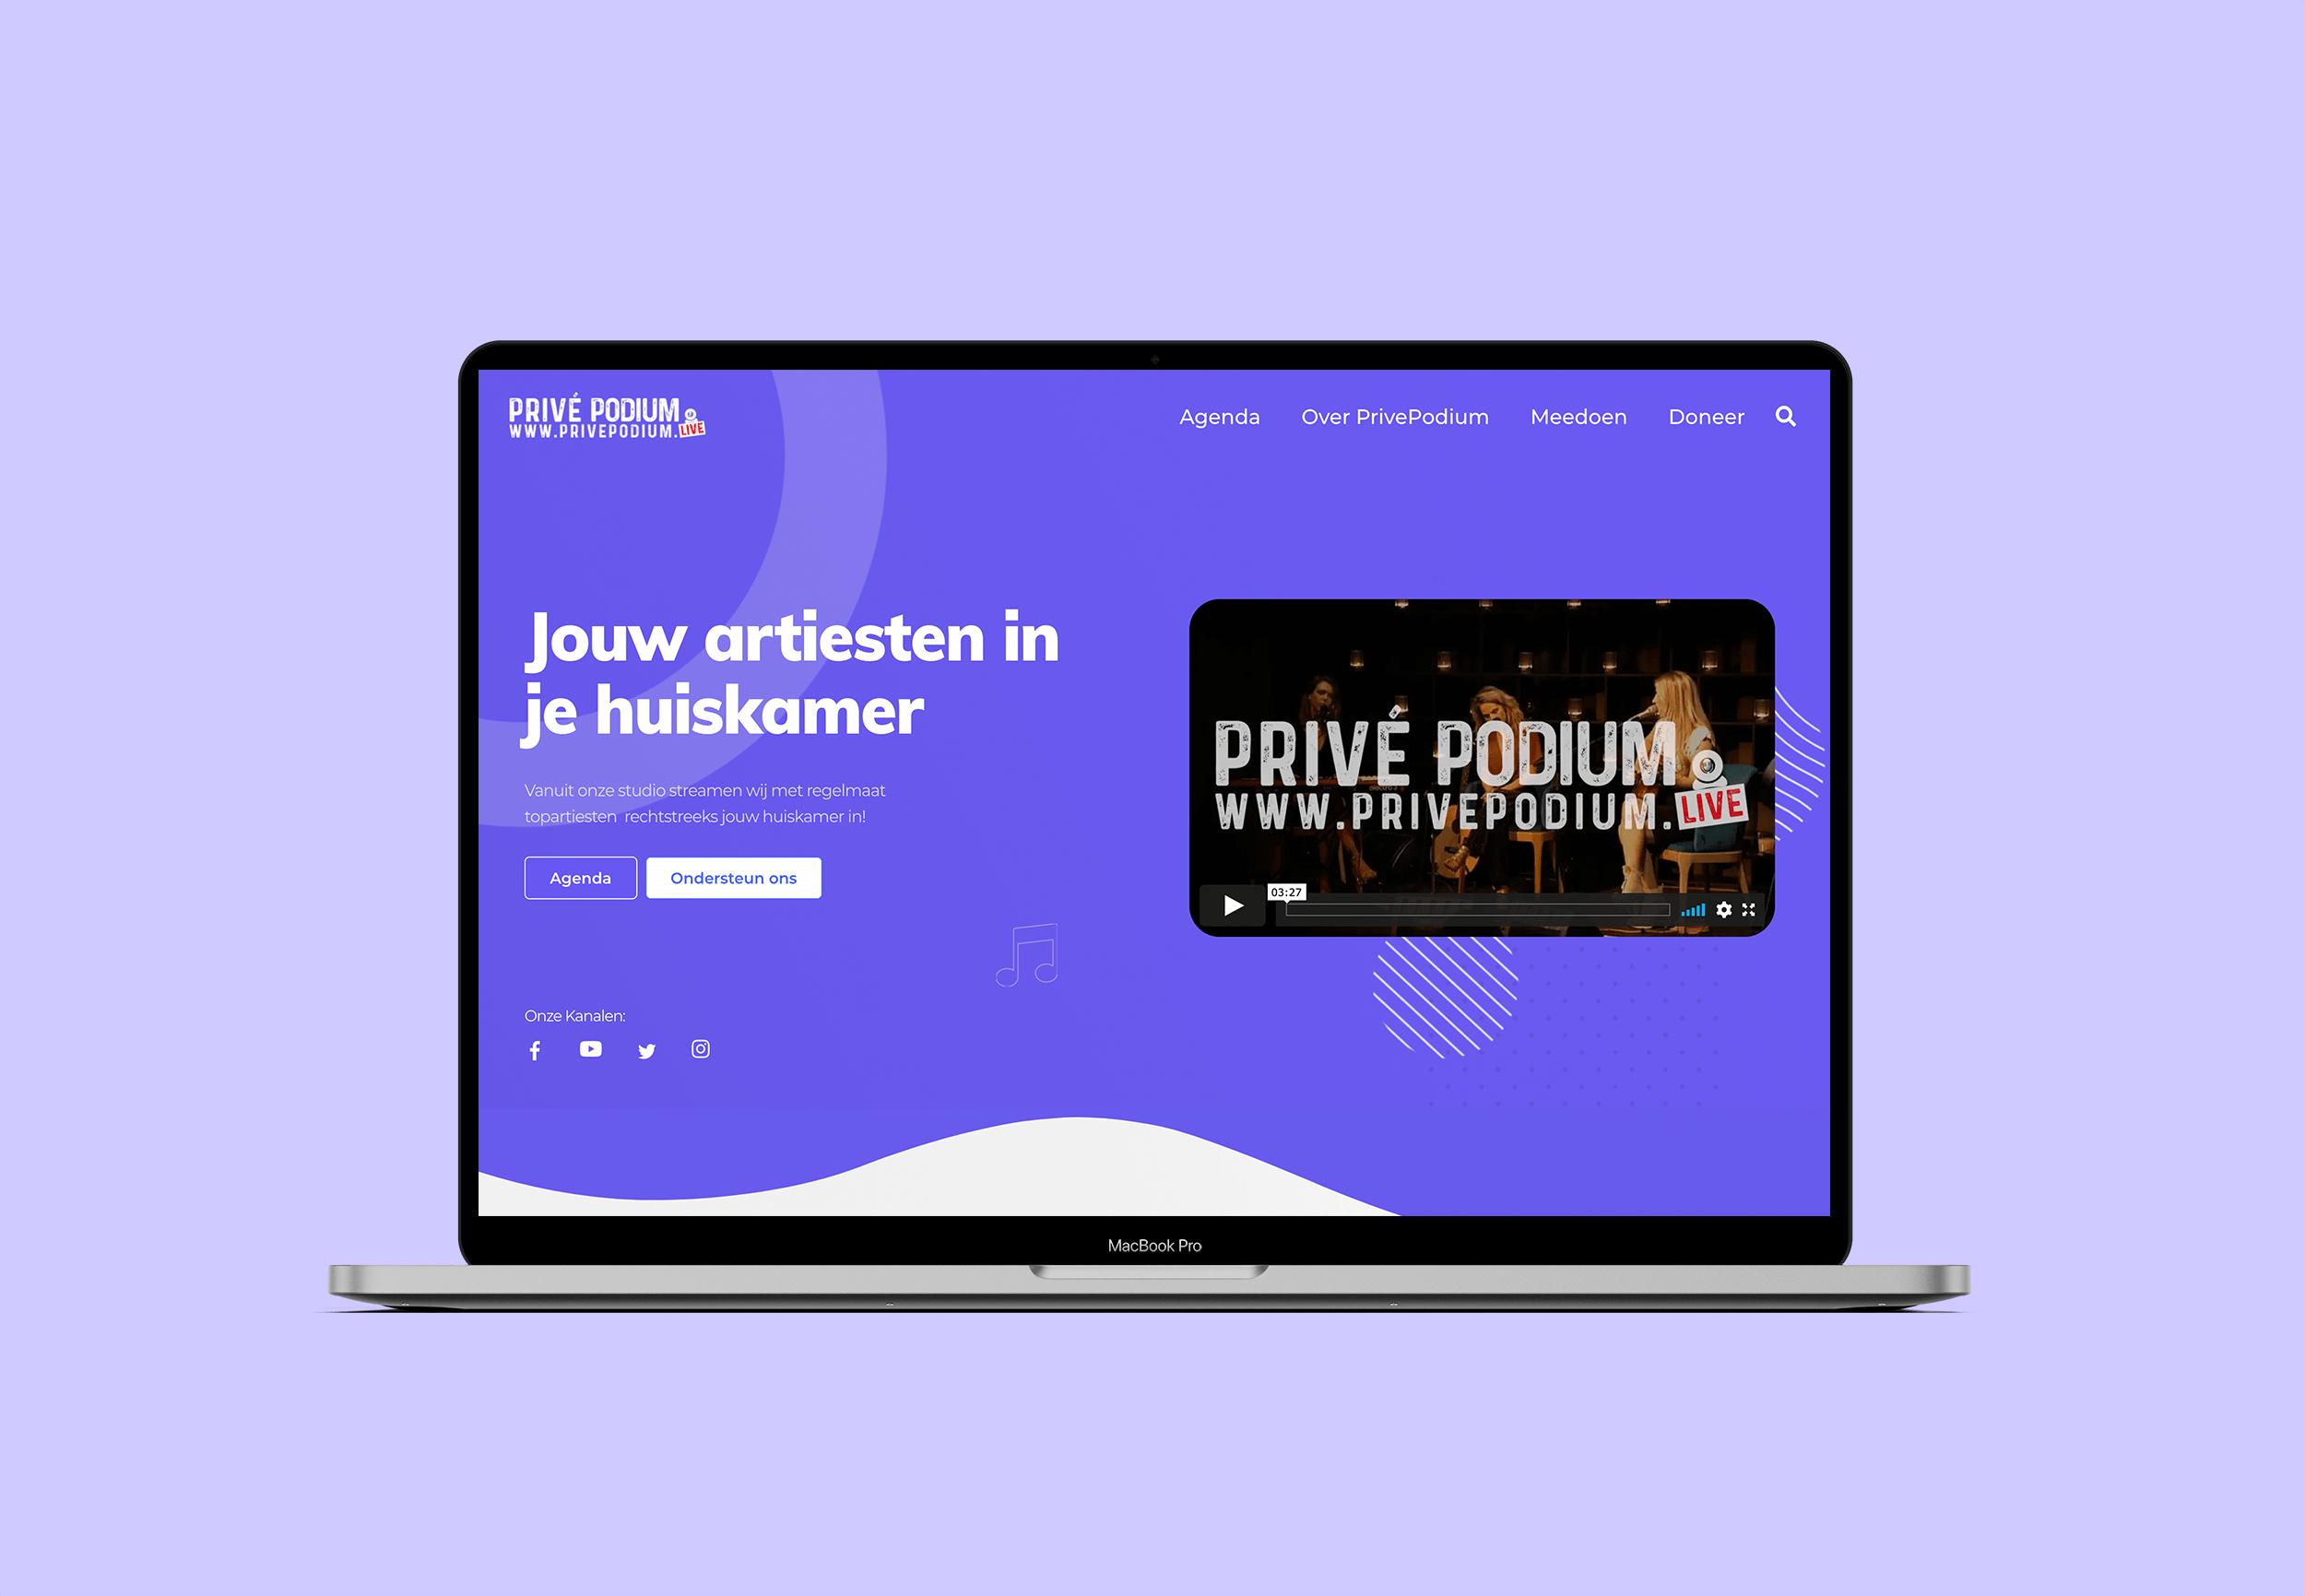 Privepodium.live - Website